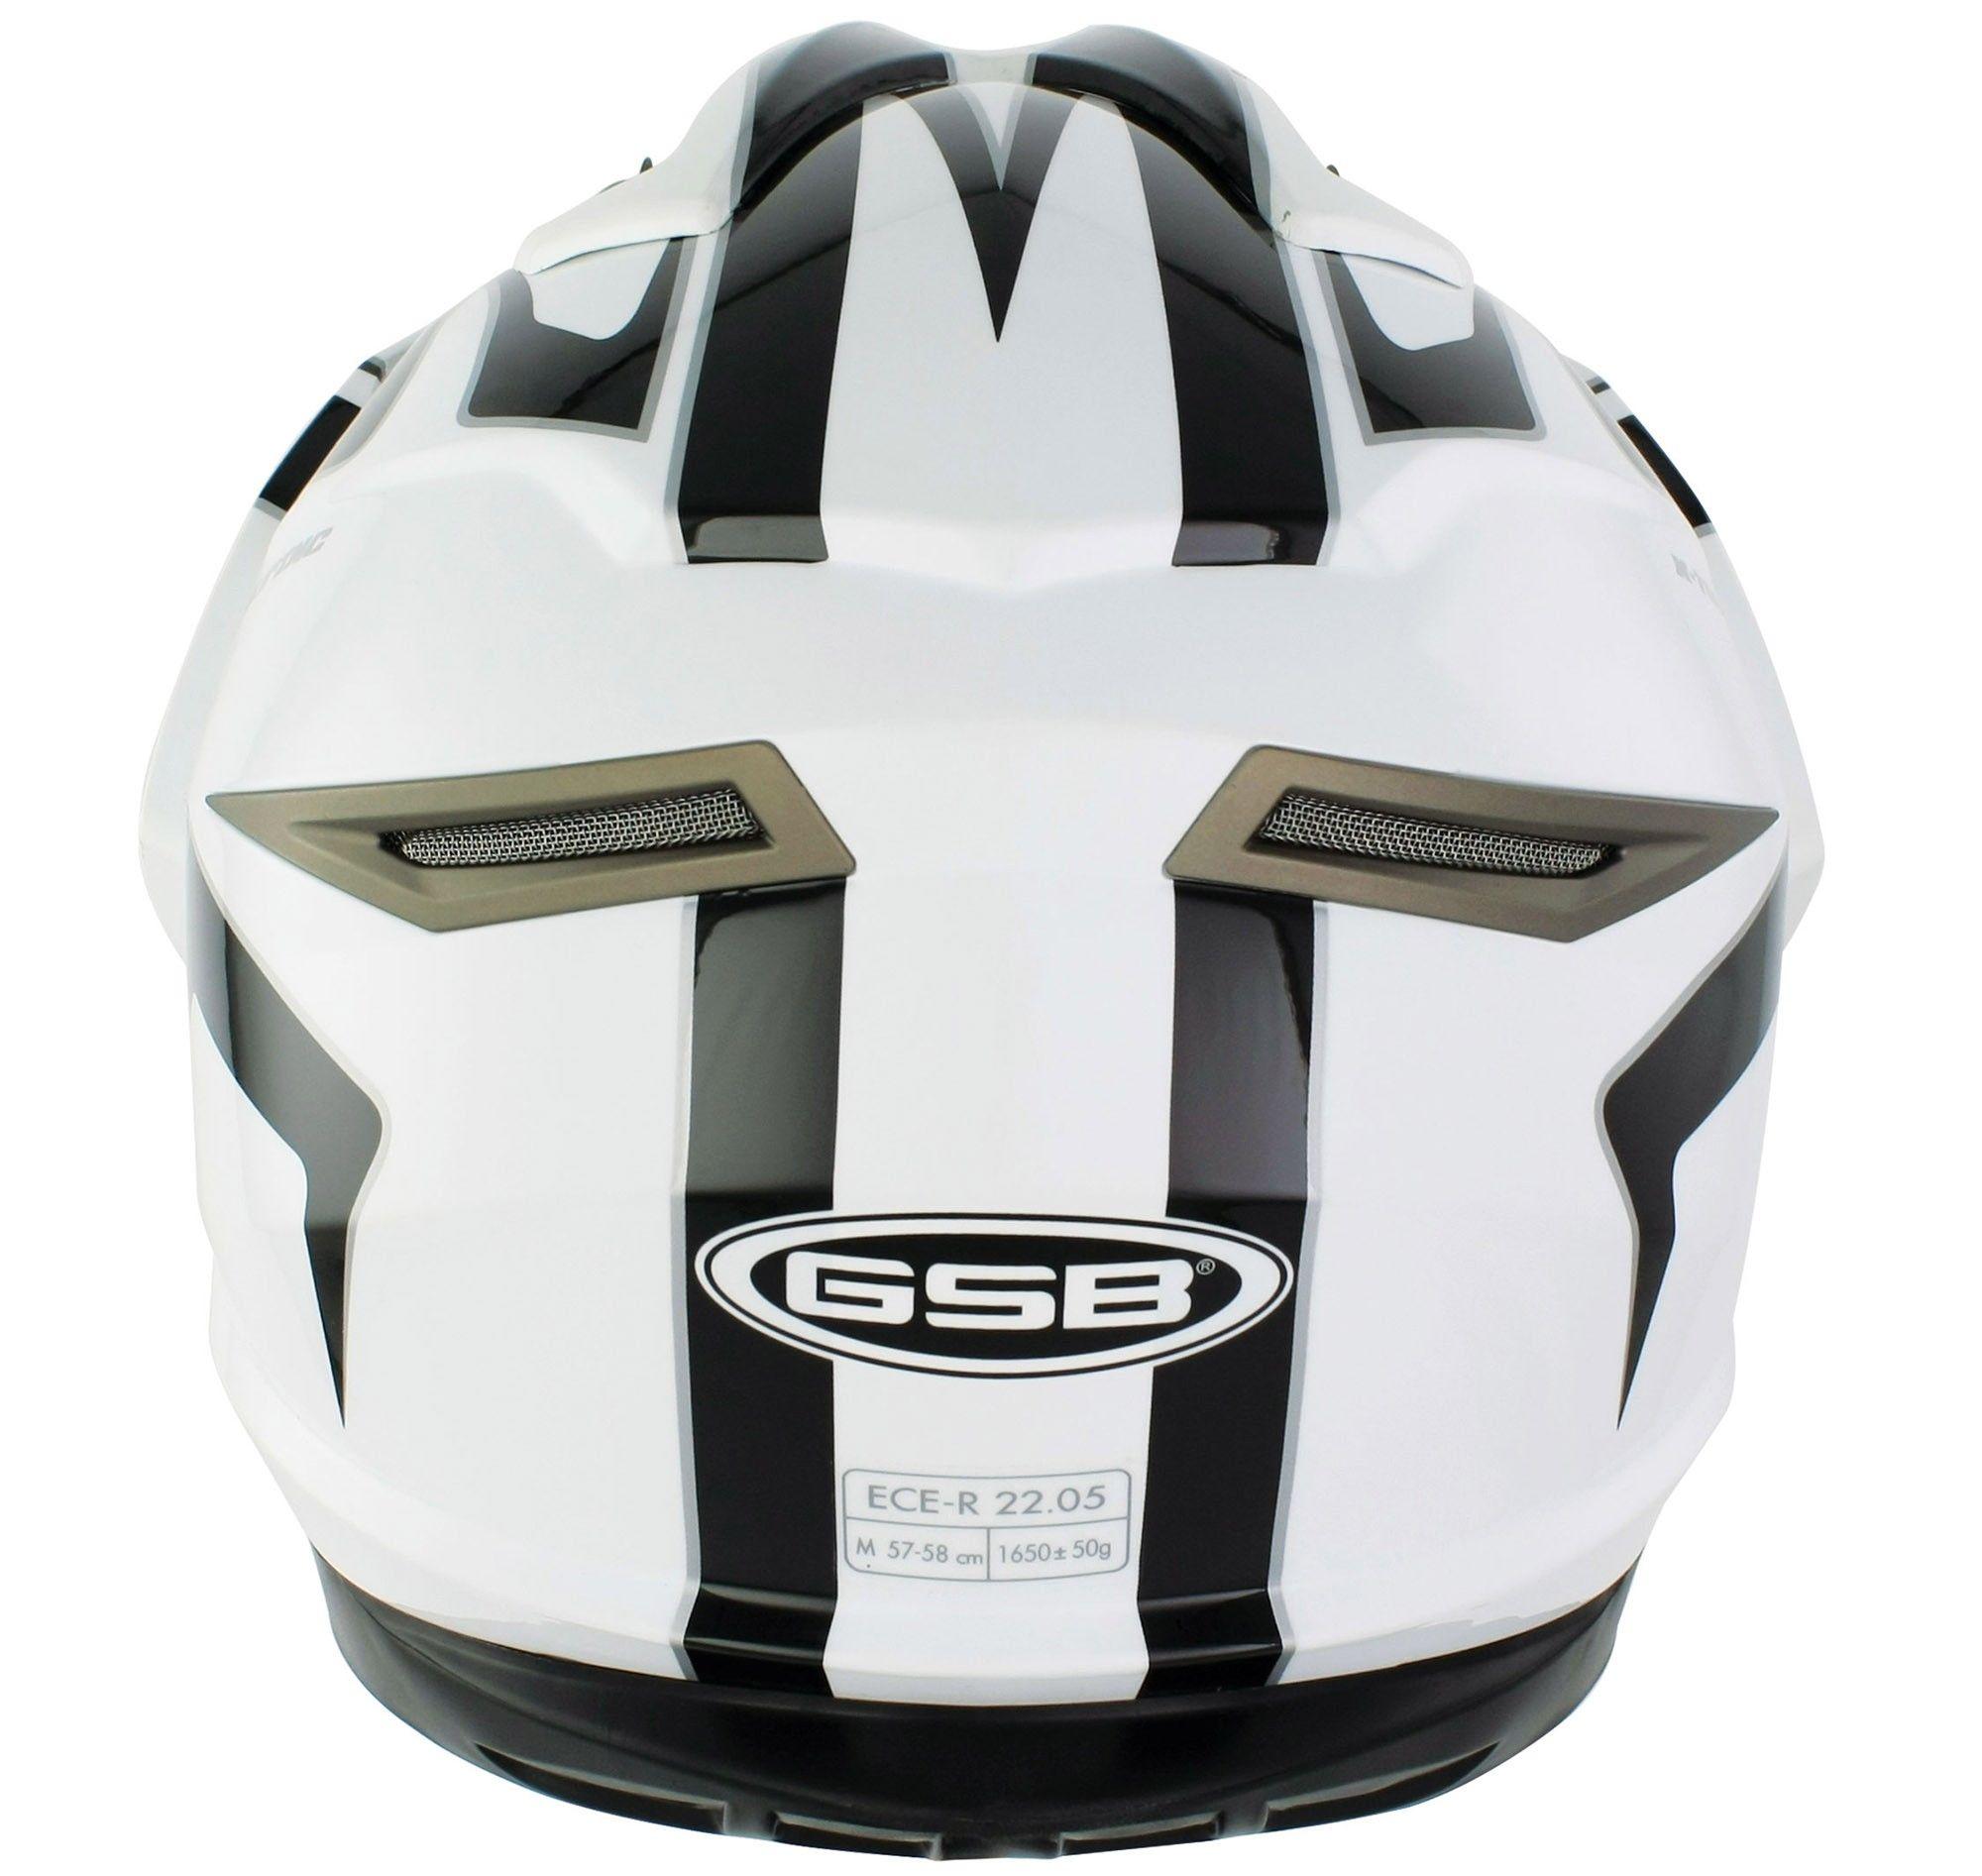 【GSB】XP-14A Adventure Dual Sport 越野安全帽 - 「Webike-摩托百貨」